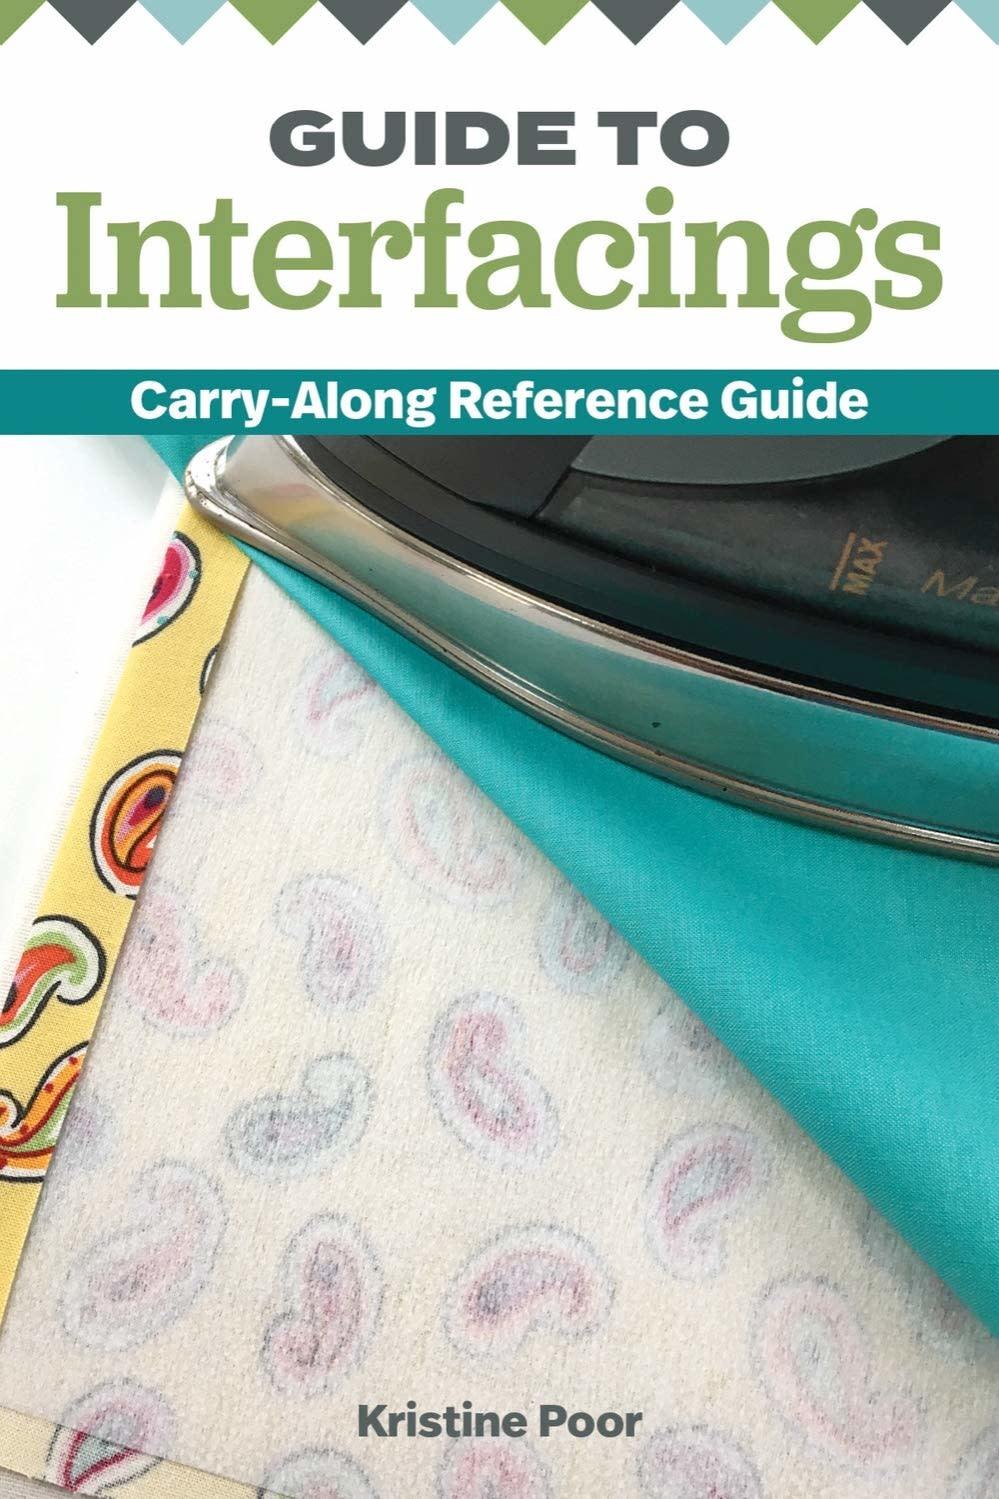 "LANDAUER PUBLISHING Guide to Interfacings: Carry-along Reference Guide (Landauer) 4X6"""